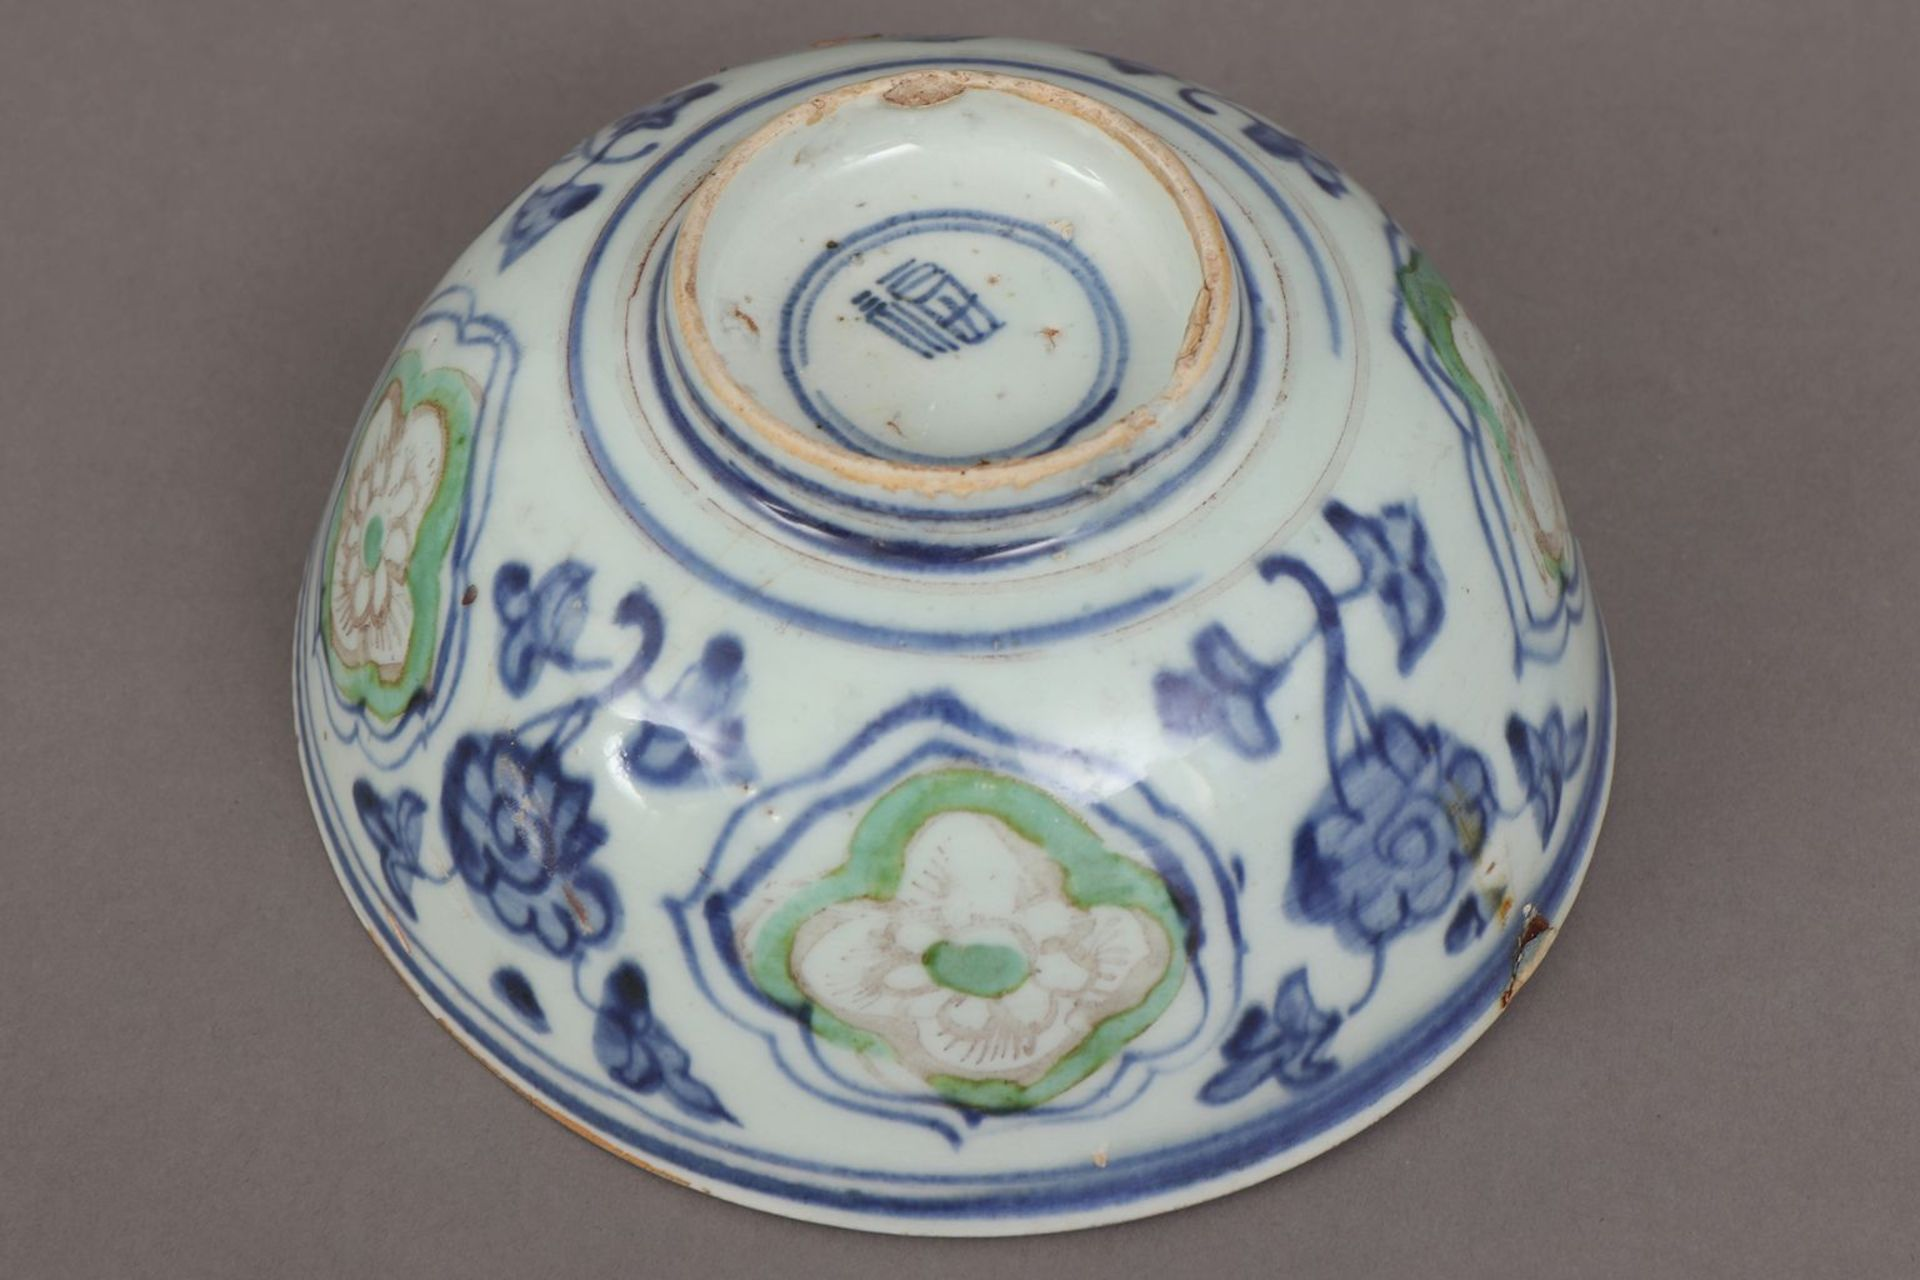 Chinesische Porzellanschale - Image 2 of 5